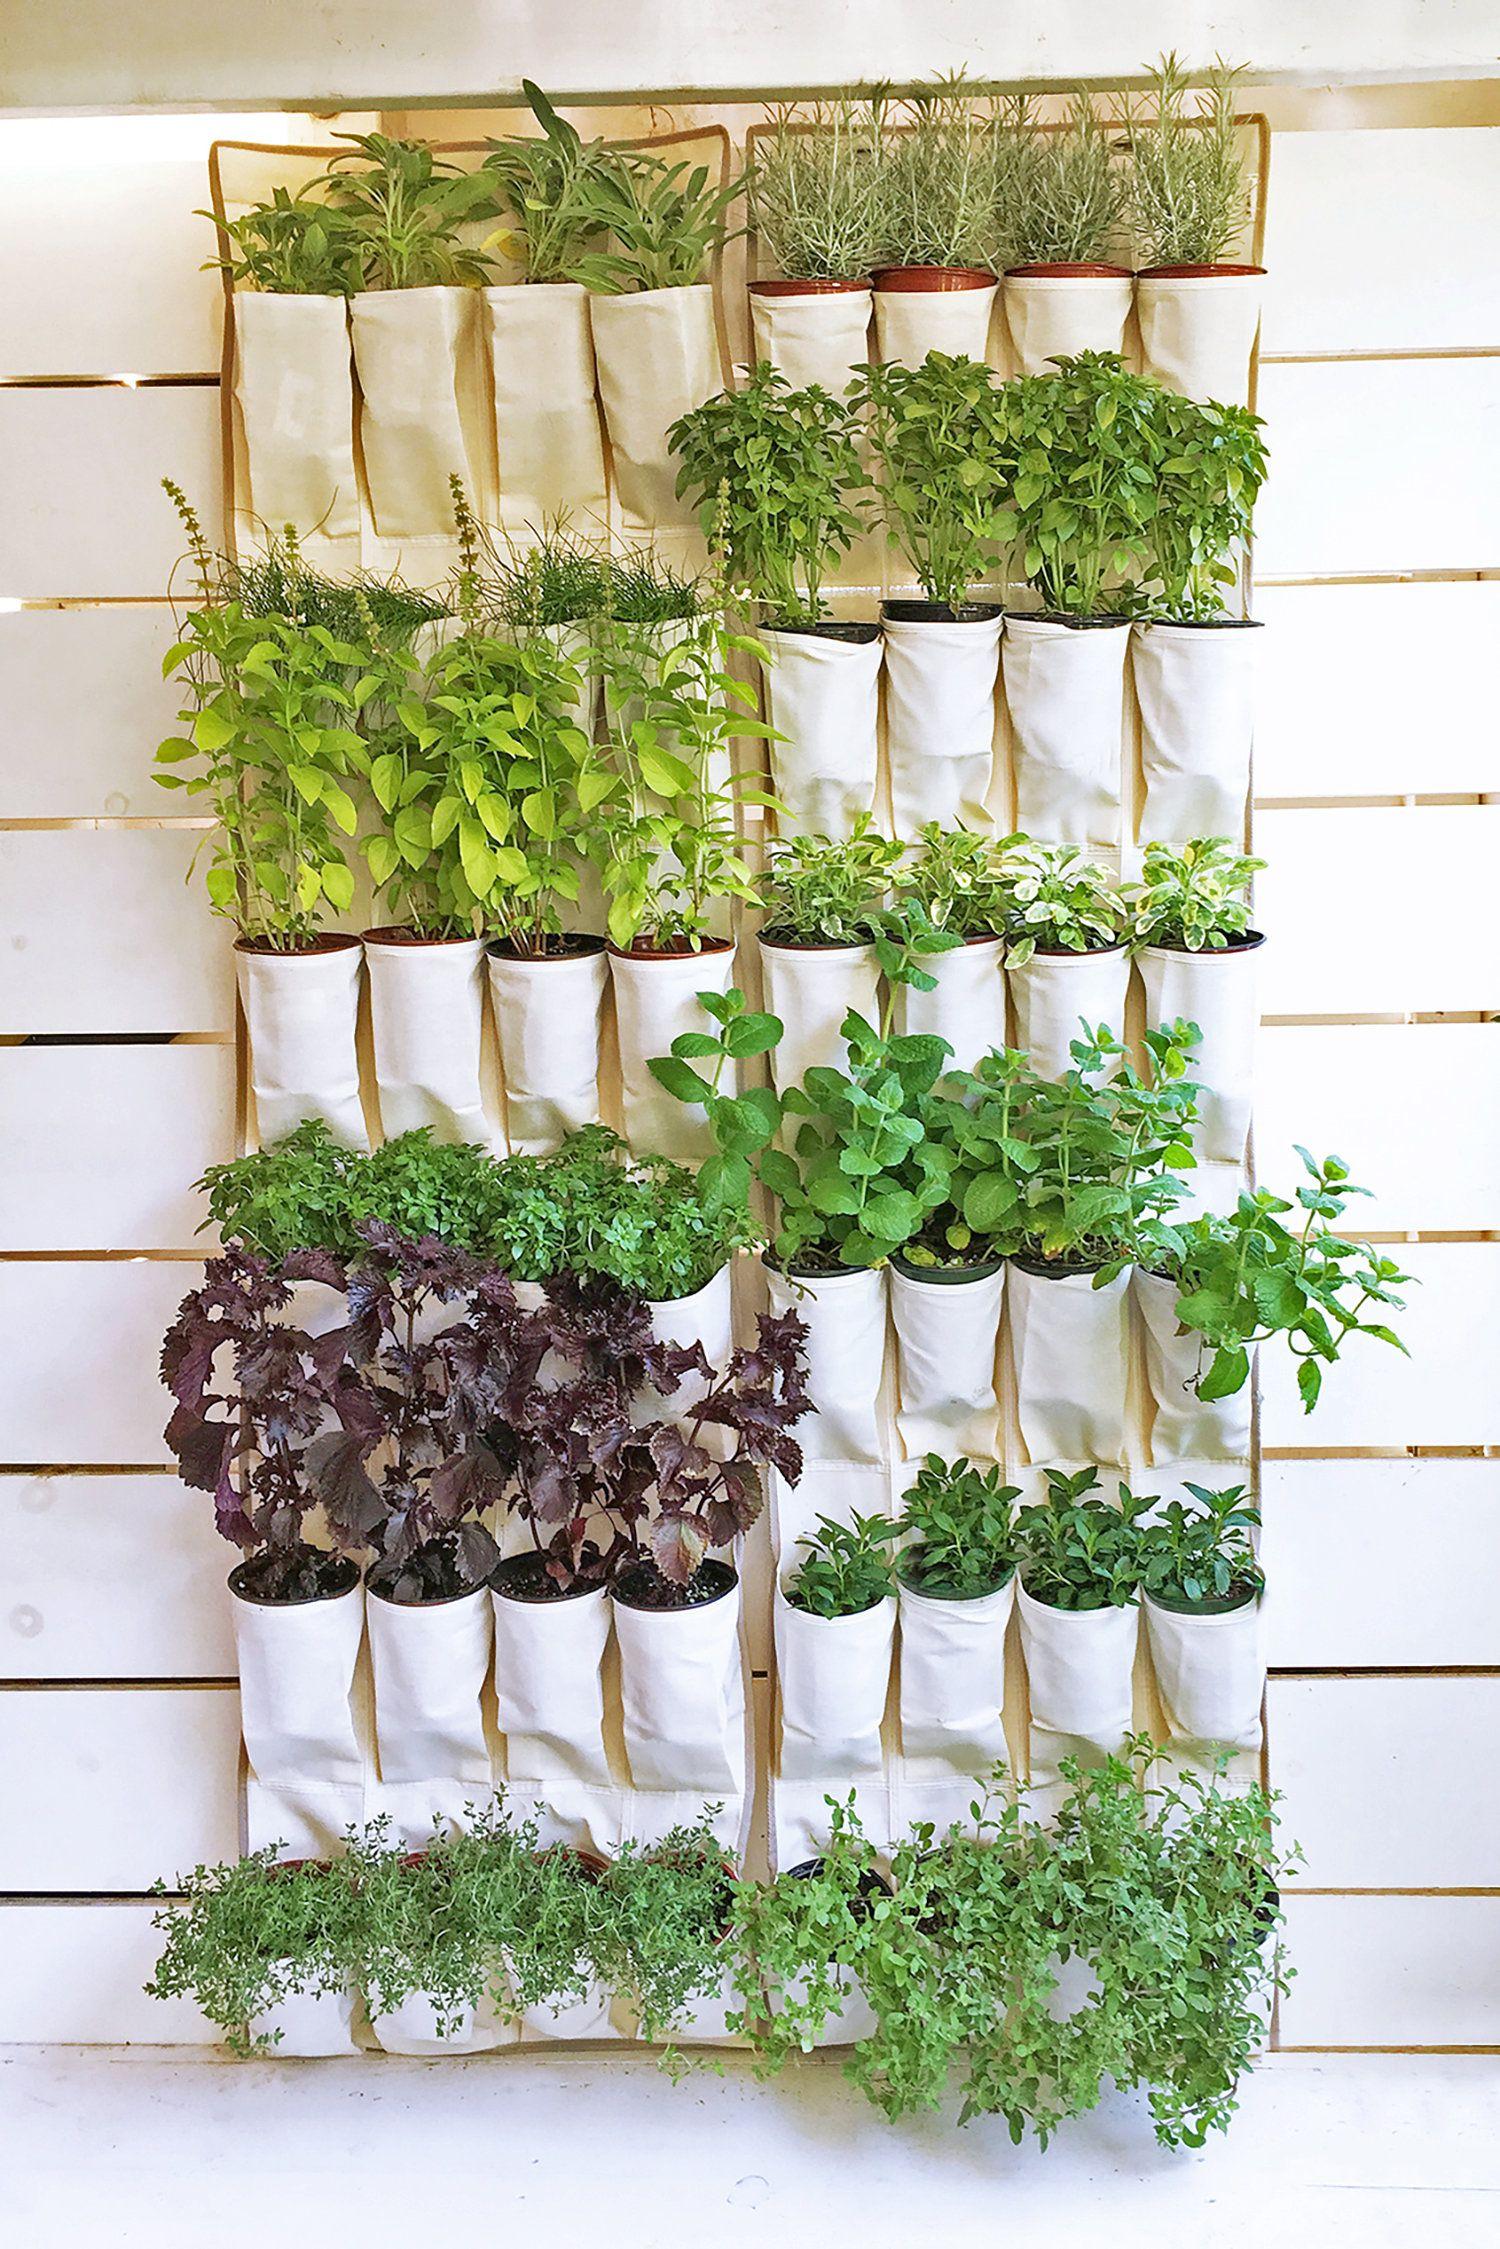 12 diy gardening ideas indoor herb garden diy herb garden on indoor herb garden diy wall vertical planter id=49947